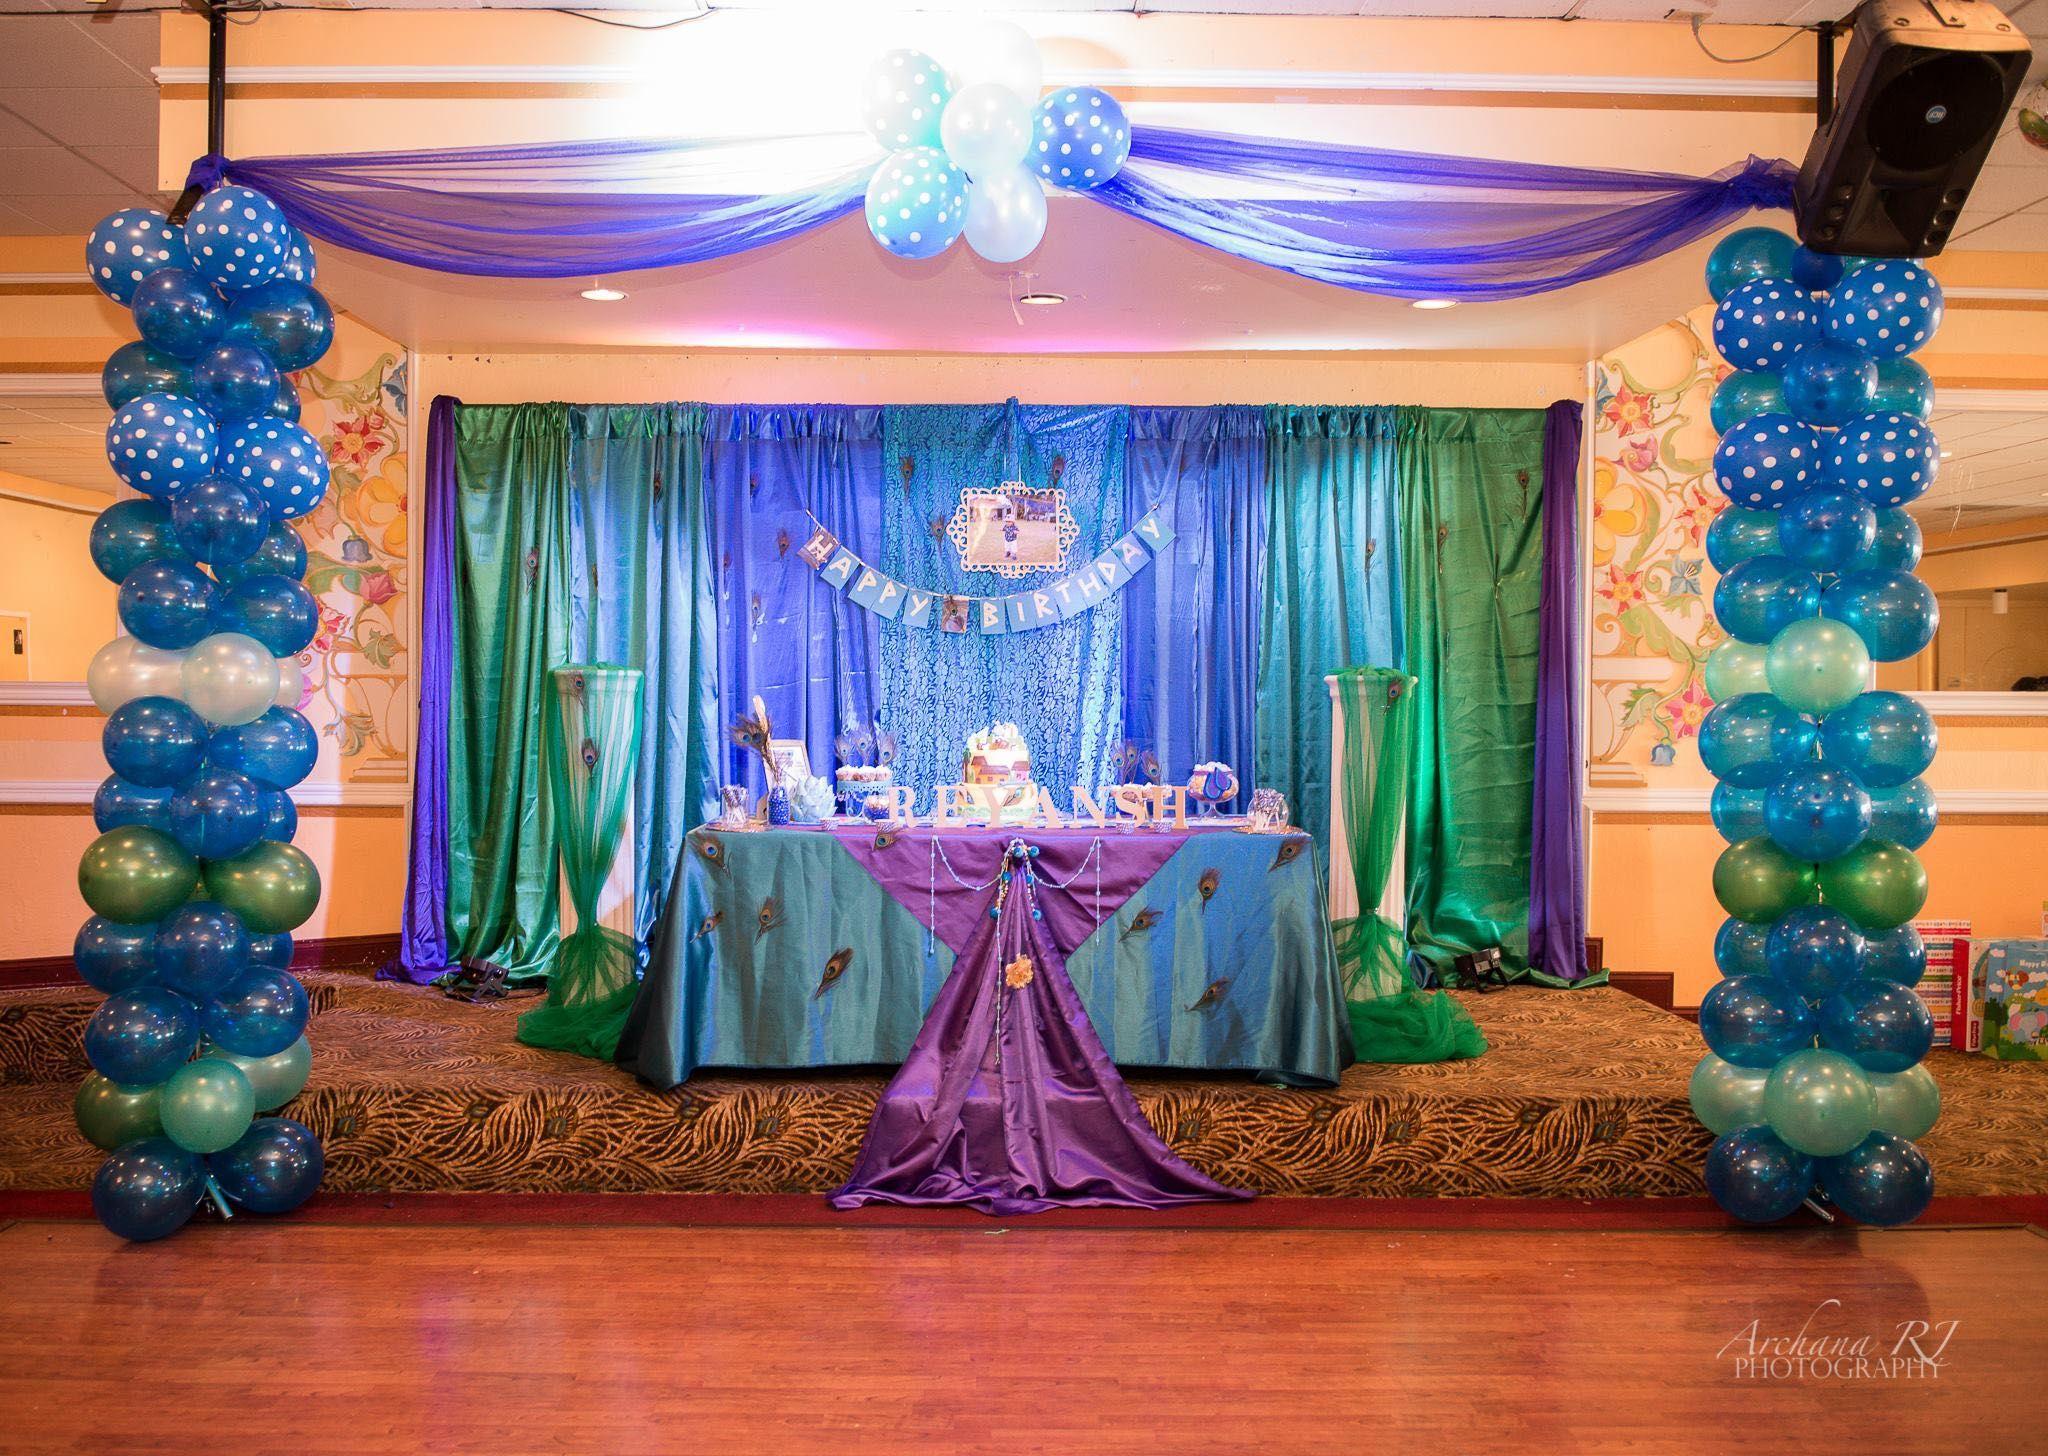 Theme For Decoration Krishna Theme Backdrop  Krishna Birthday Decoration  Pinterest .